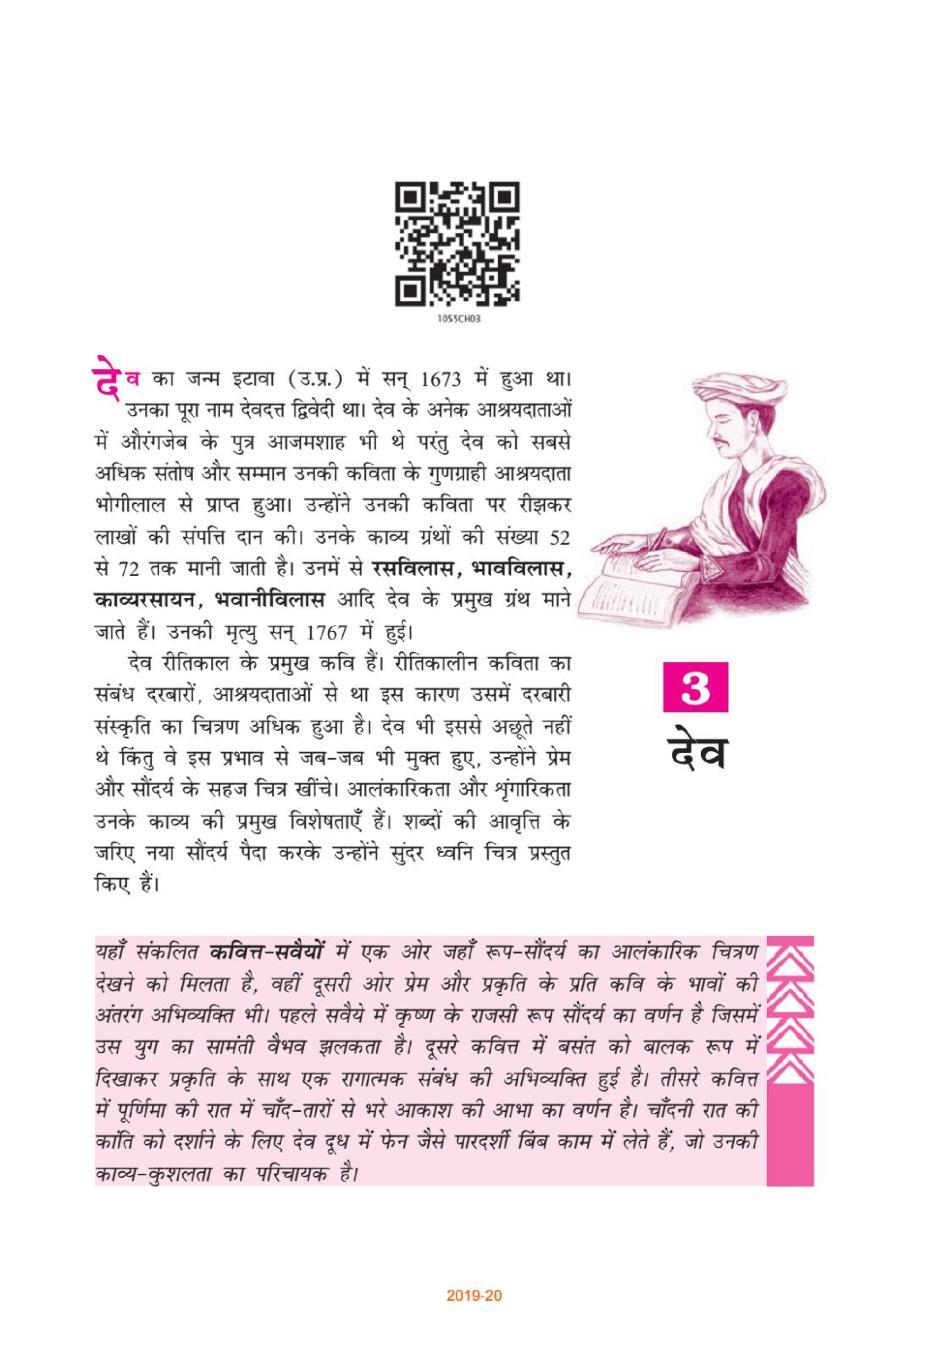 NCERT Book Class 10 Hindi (क्षितिज) Chapter 3 देव - Page 1